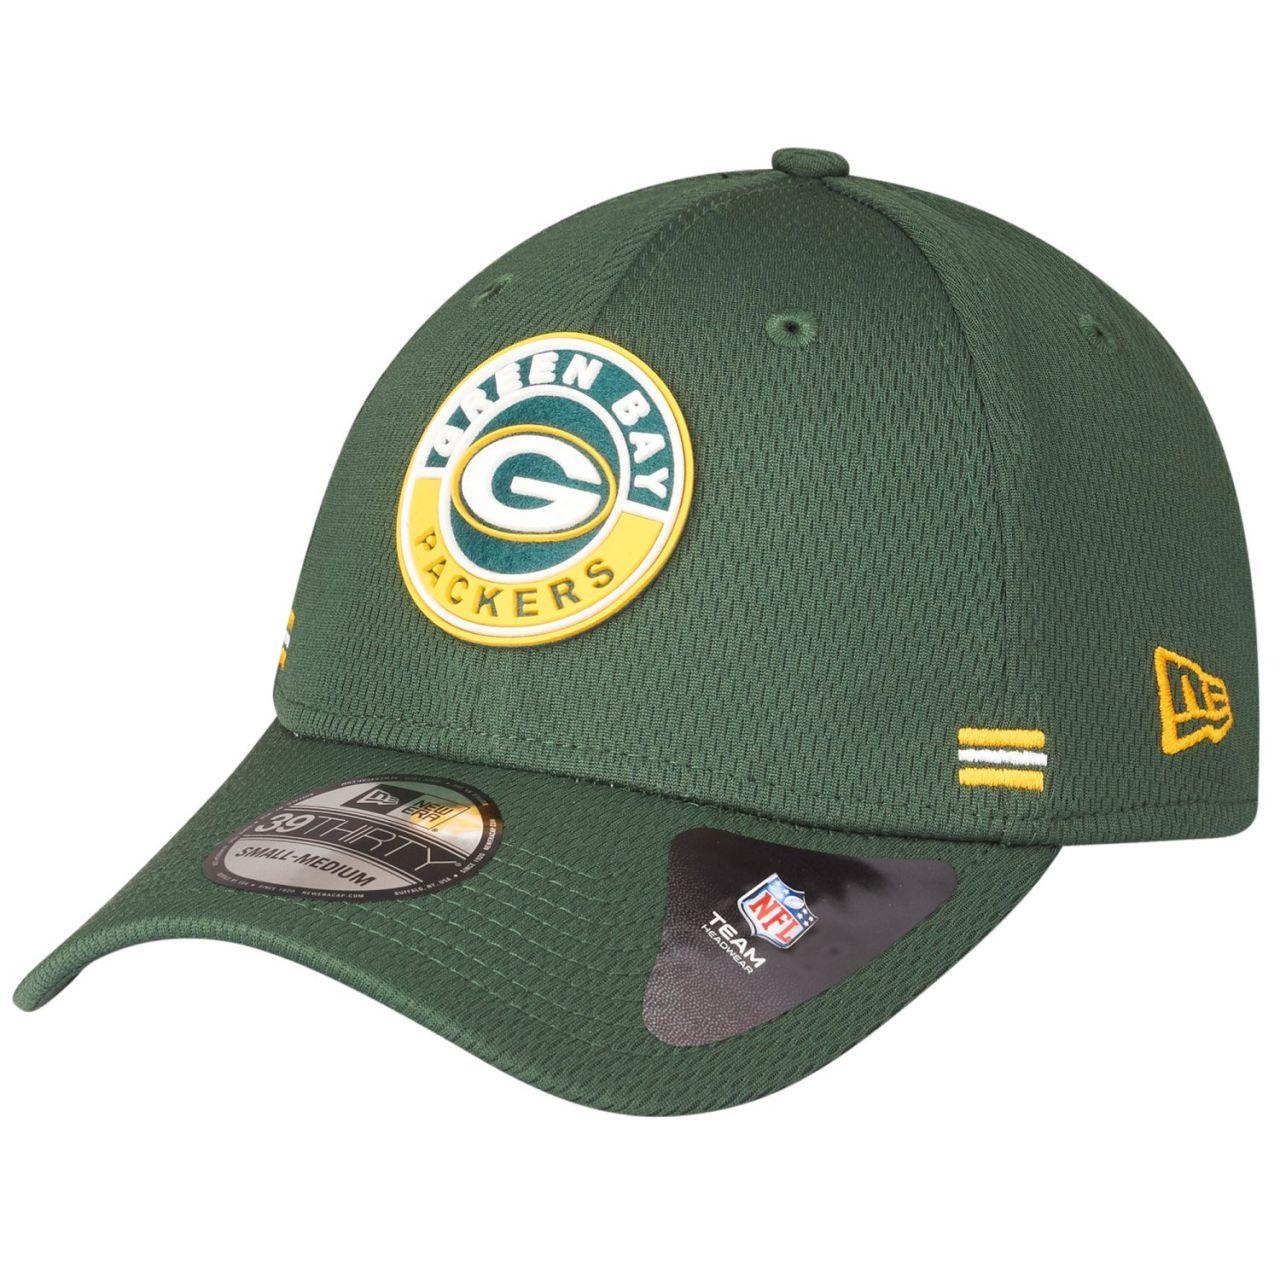 amfoo - New Era 39Thirty Cap - ROAD Green Bay Packers